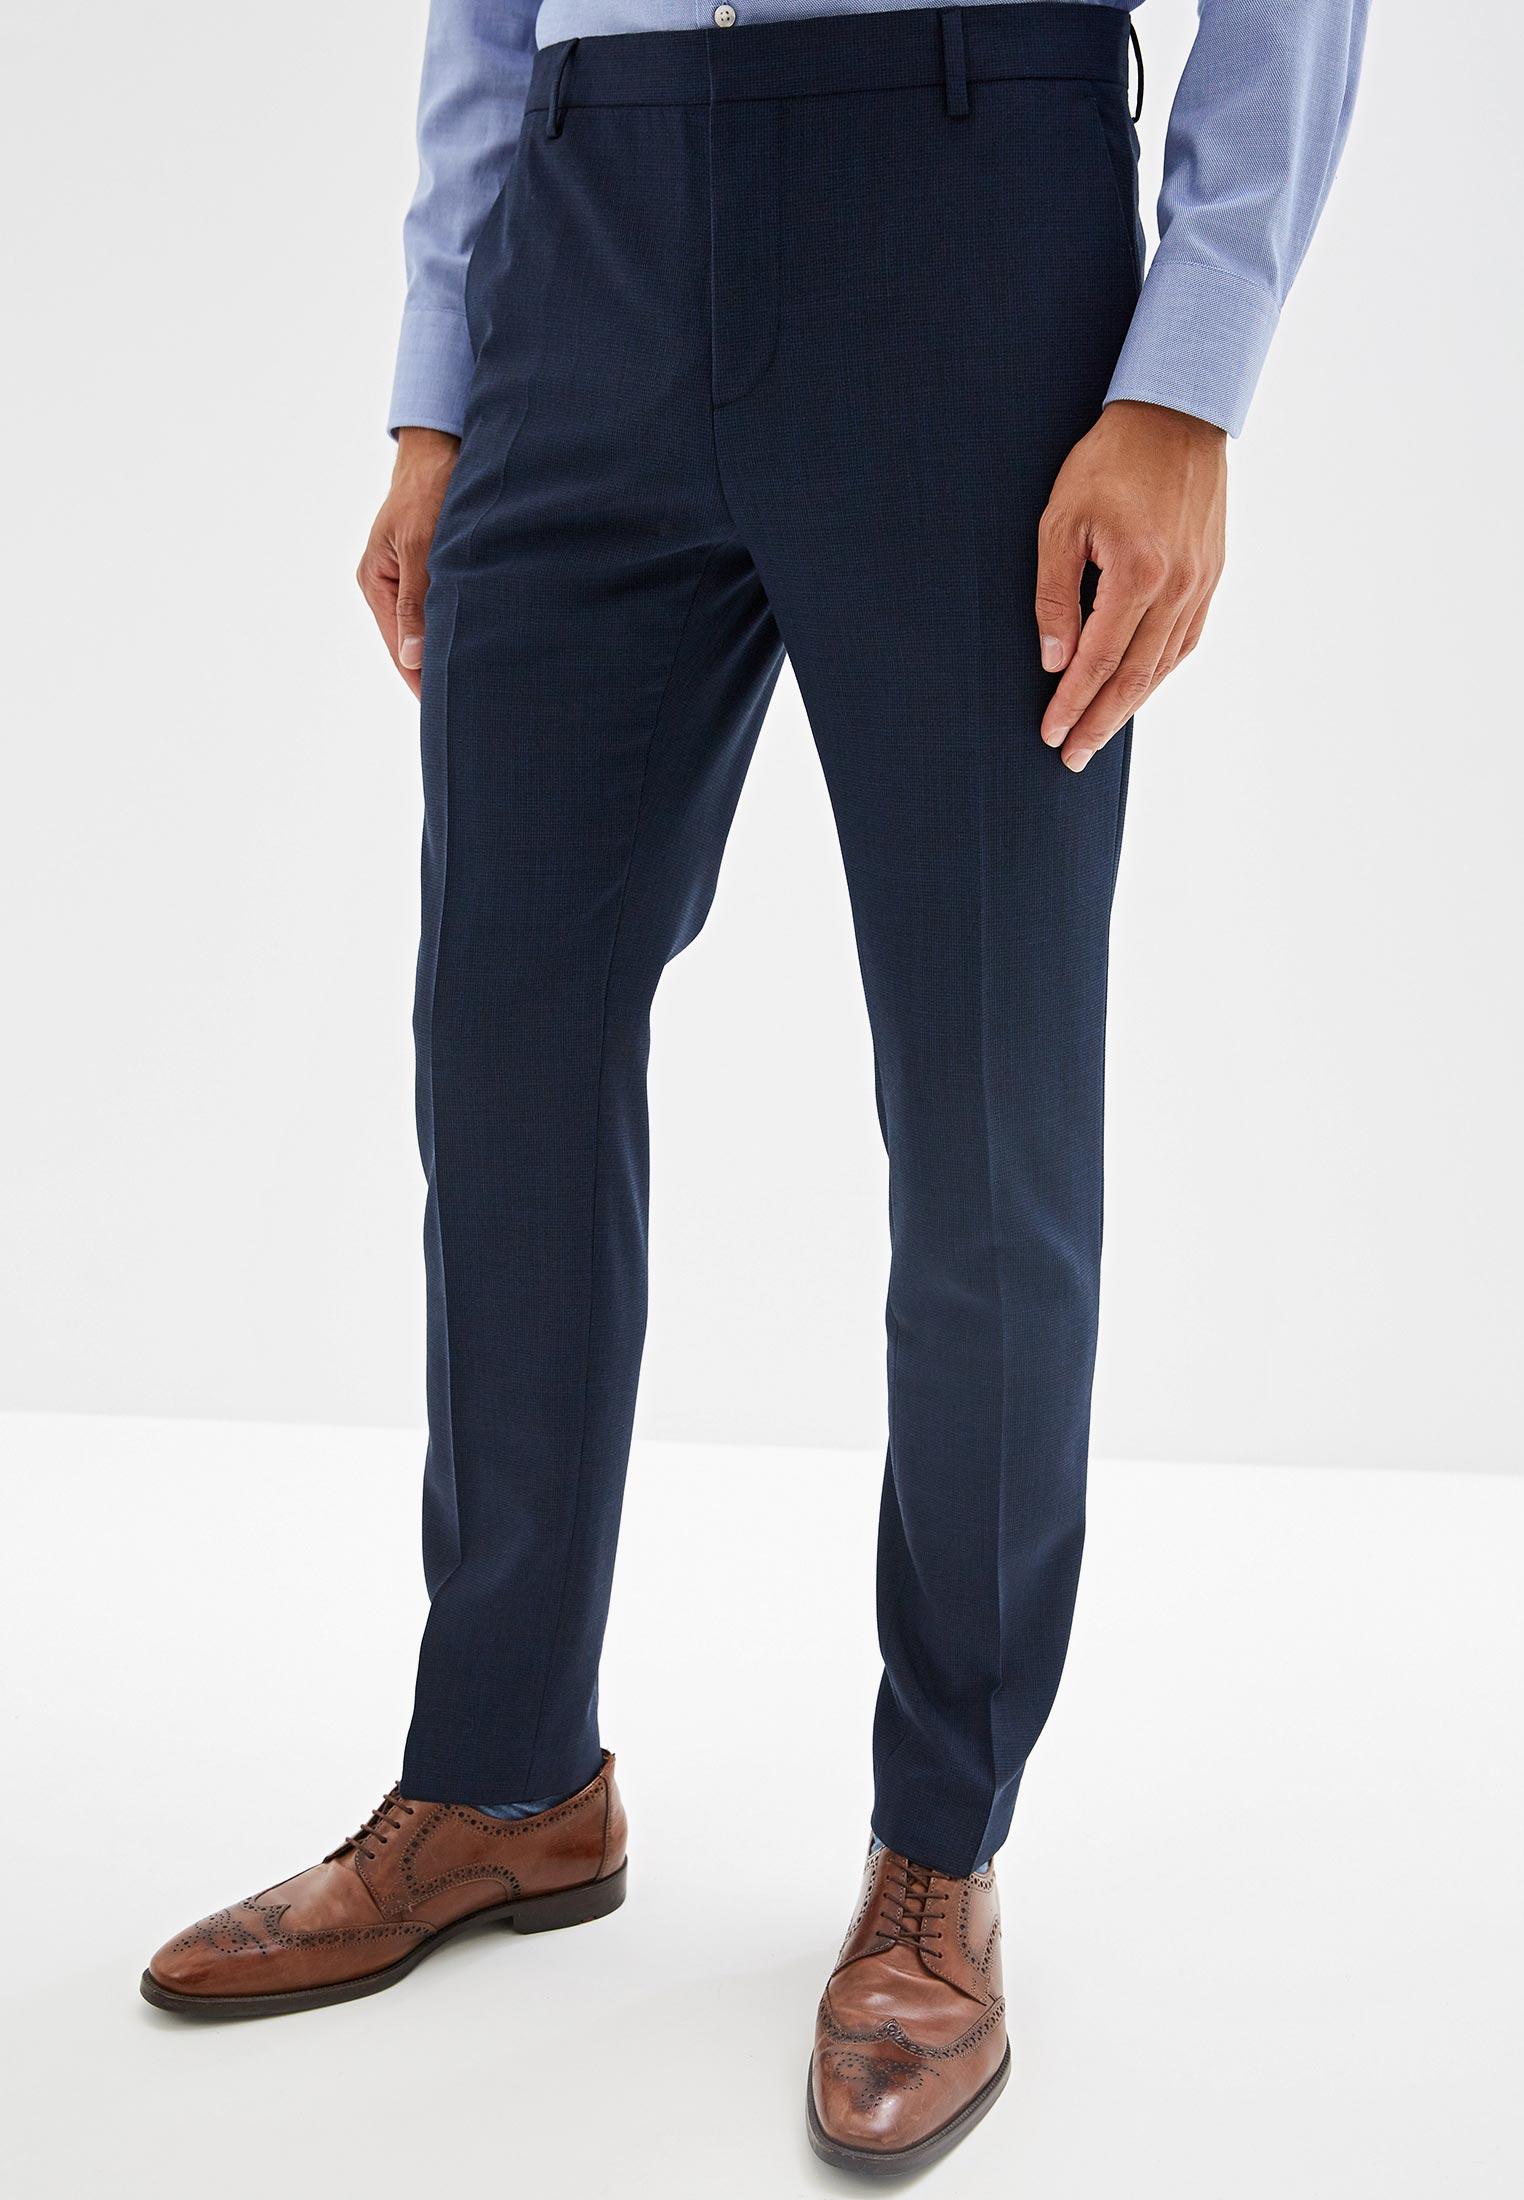 Мужские классические брюки Calvin Klein (Кельвин Кляйн) k10k104306